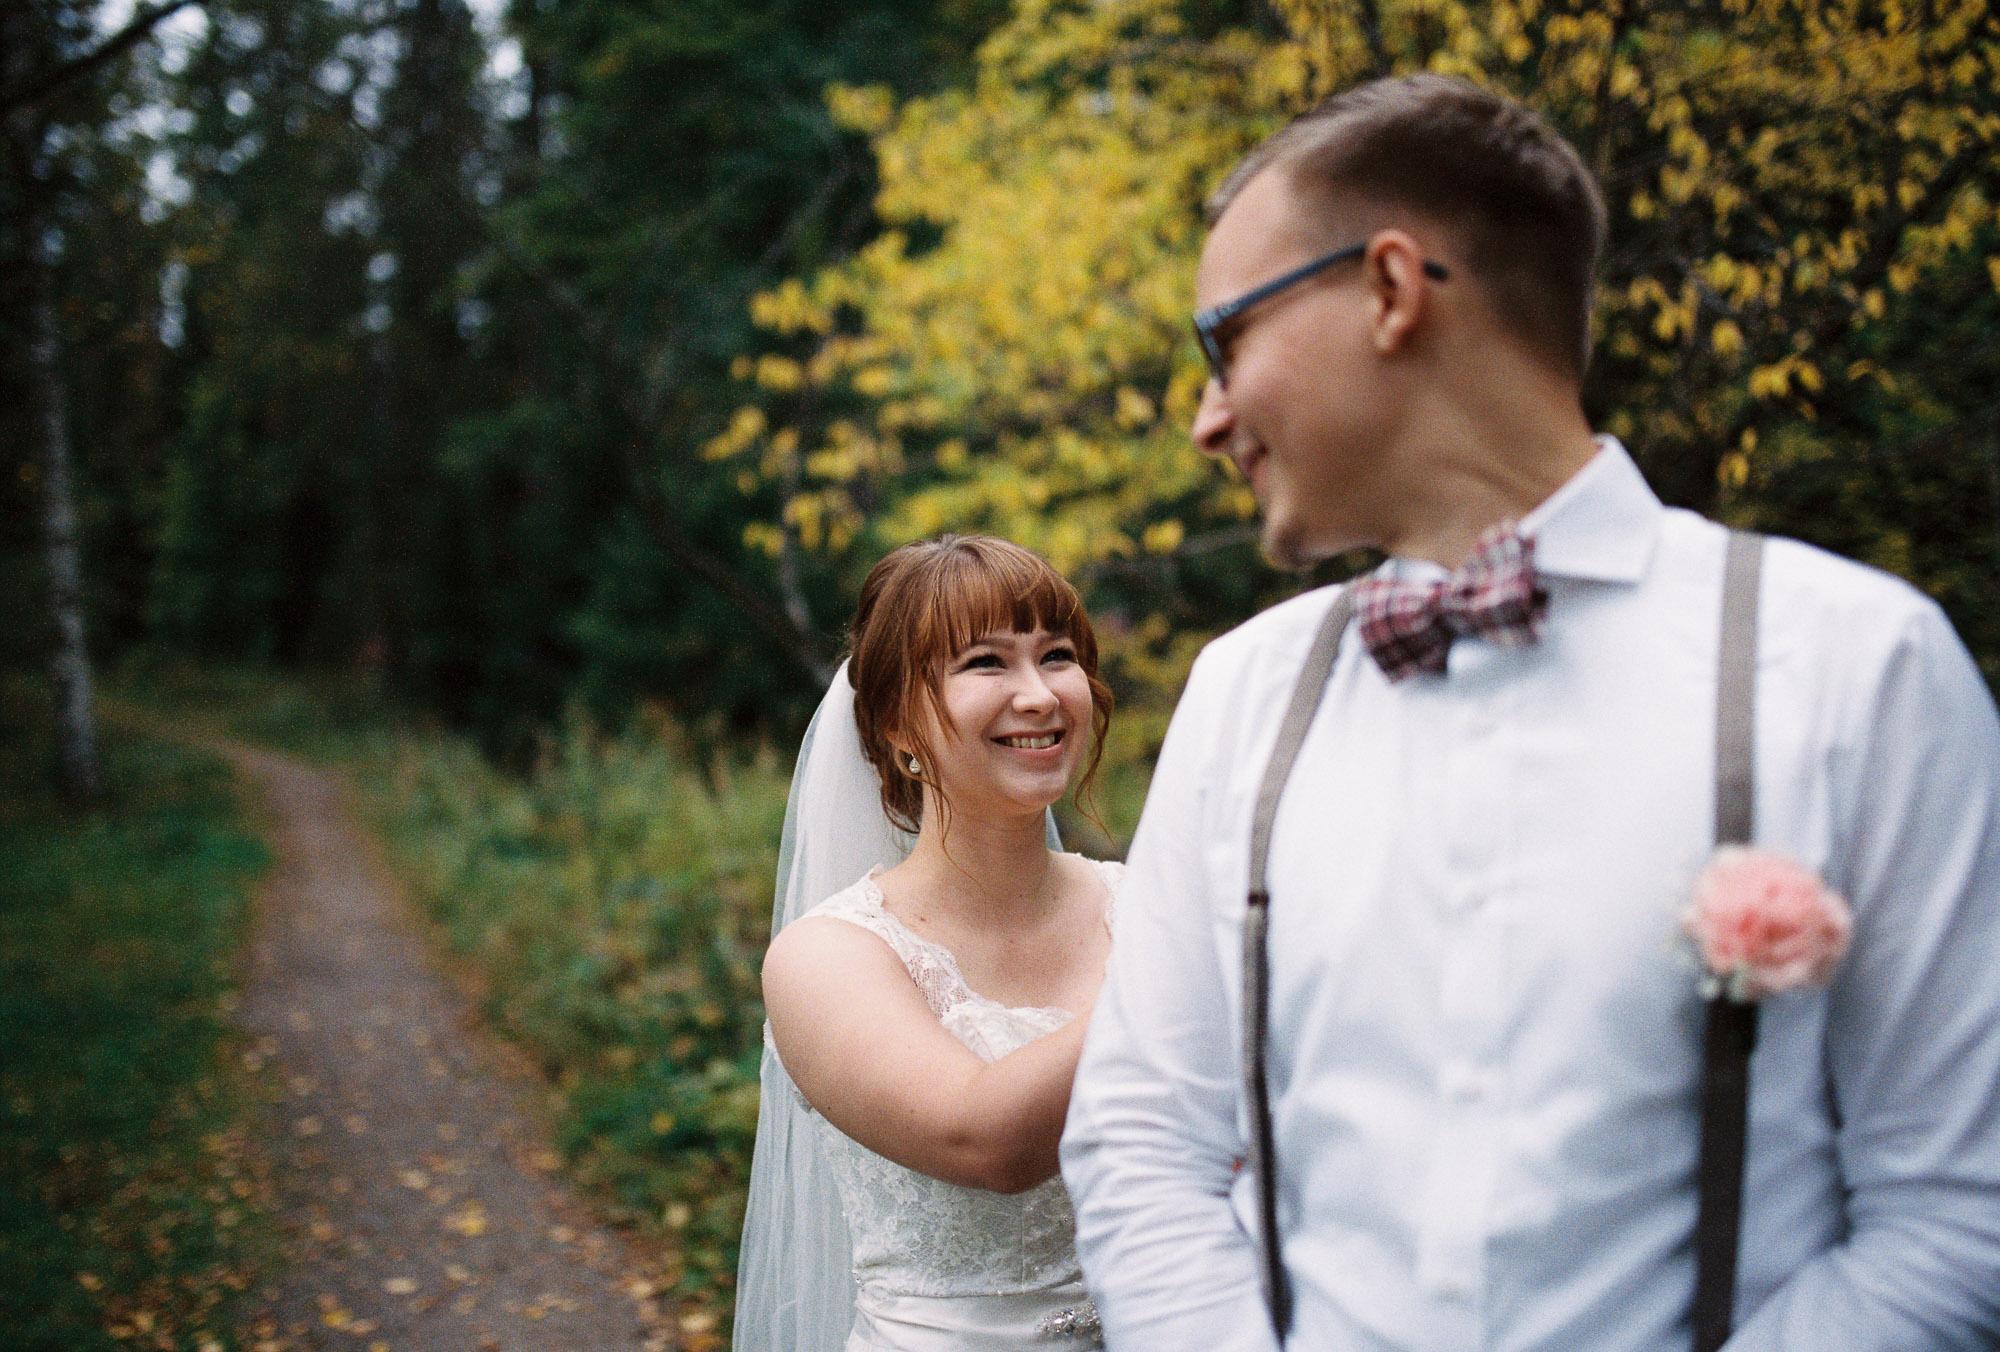 jere-satamo-analog-film-wedding-photographer-finland-068.jpg